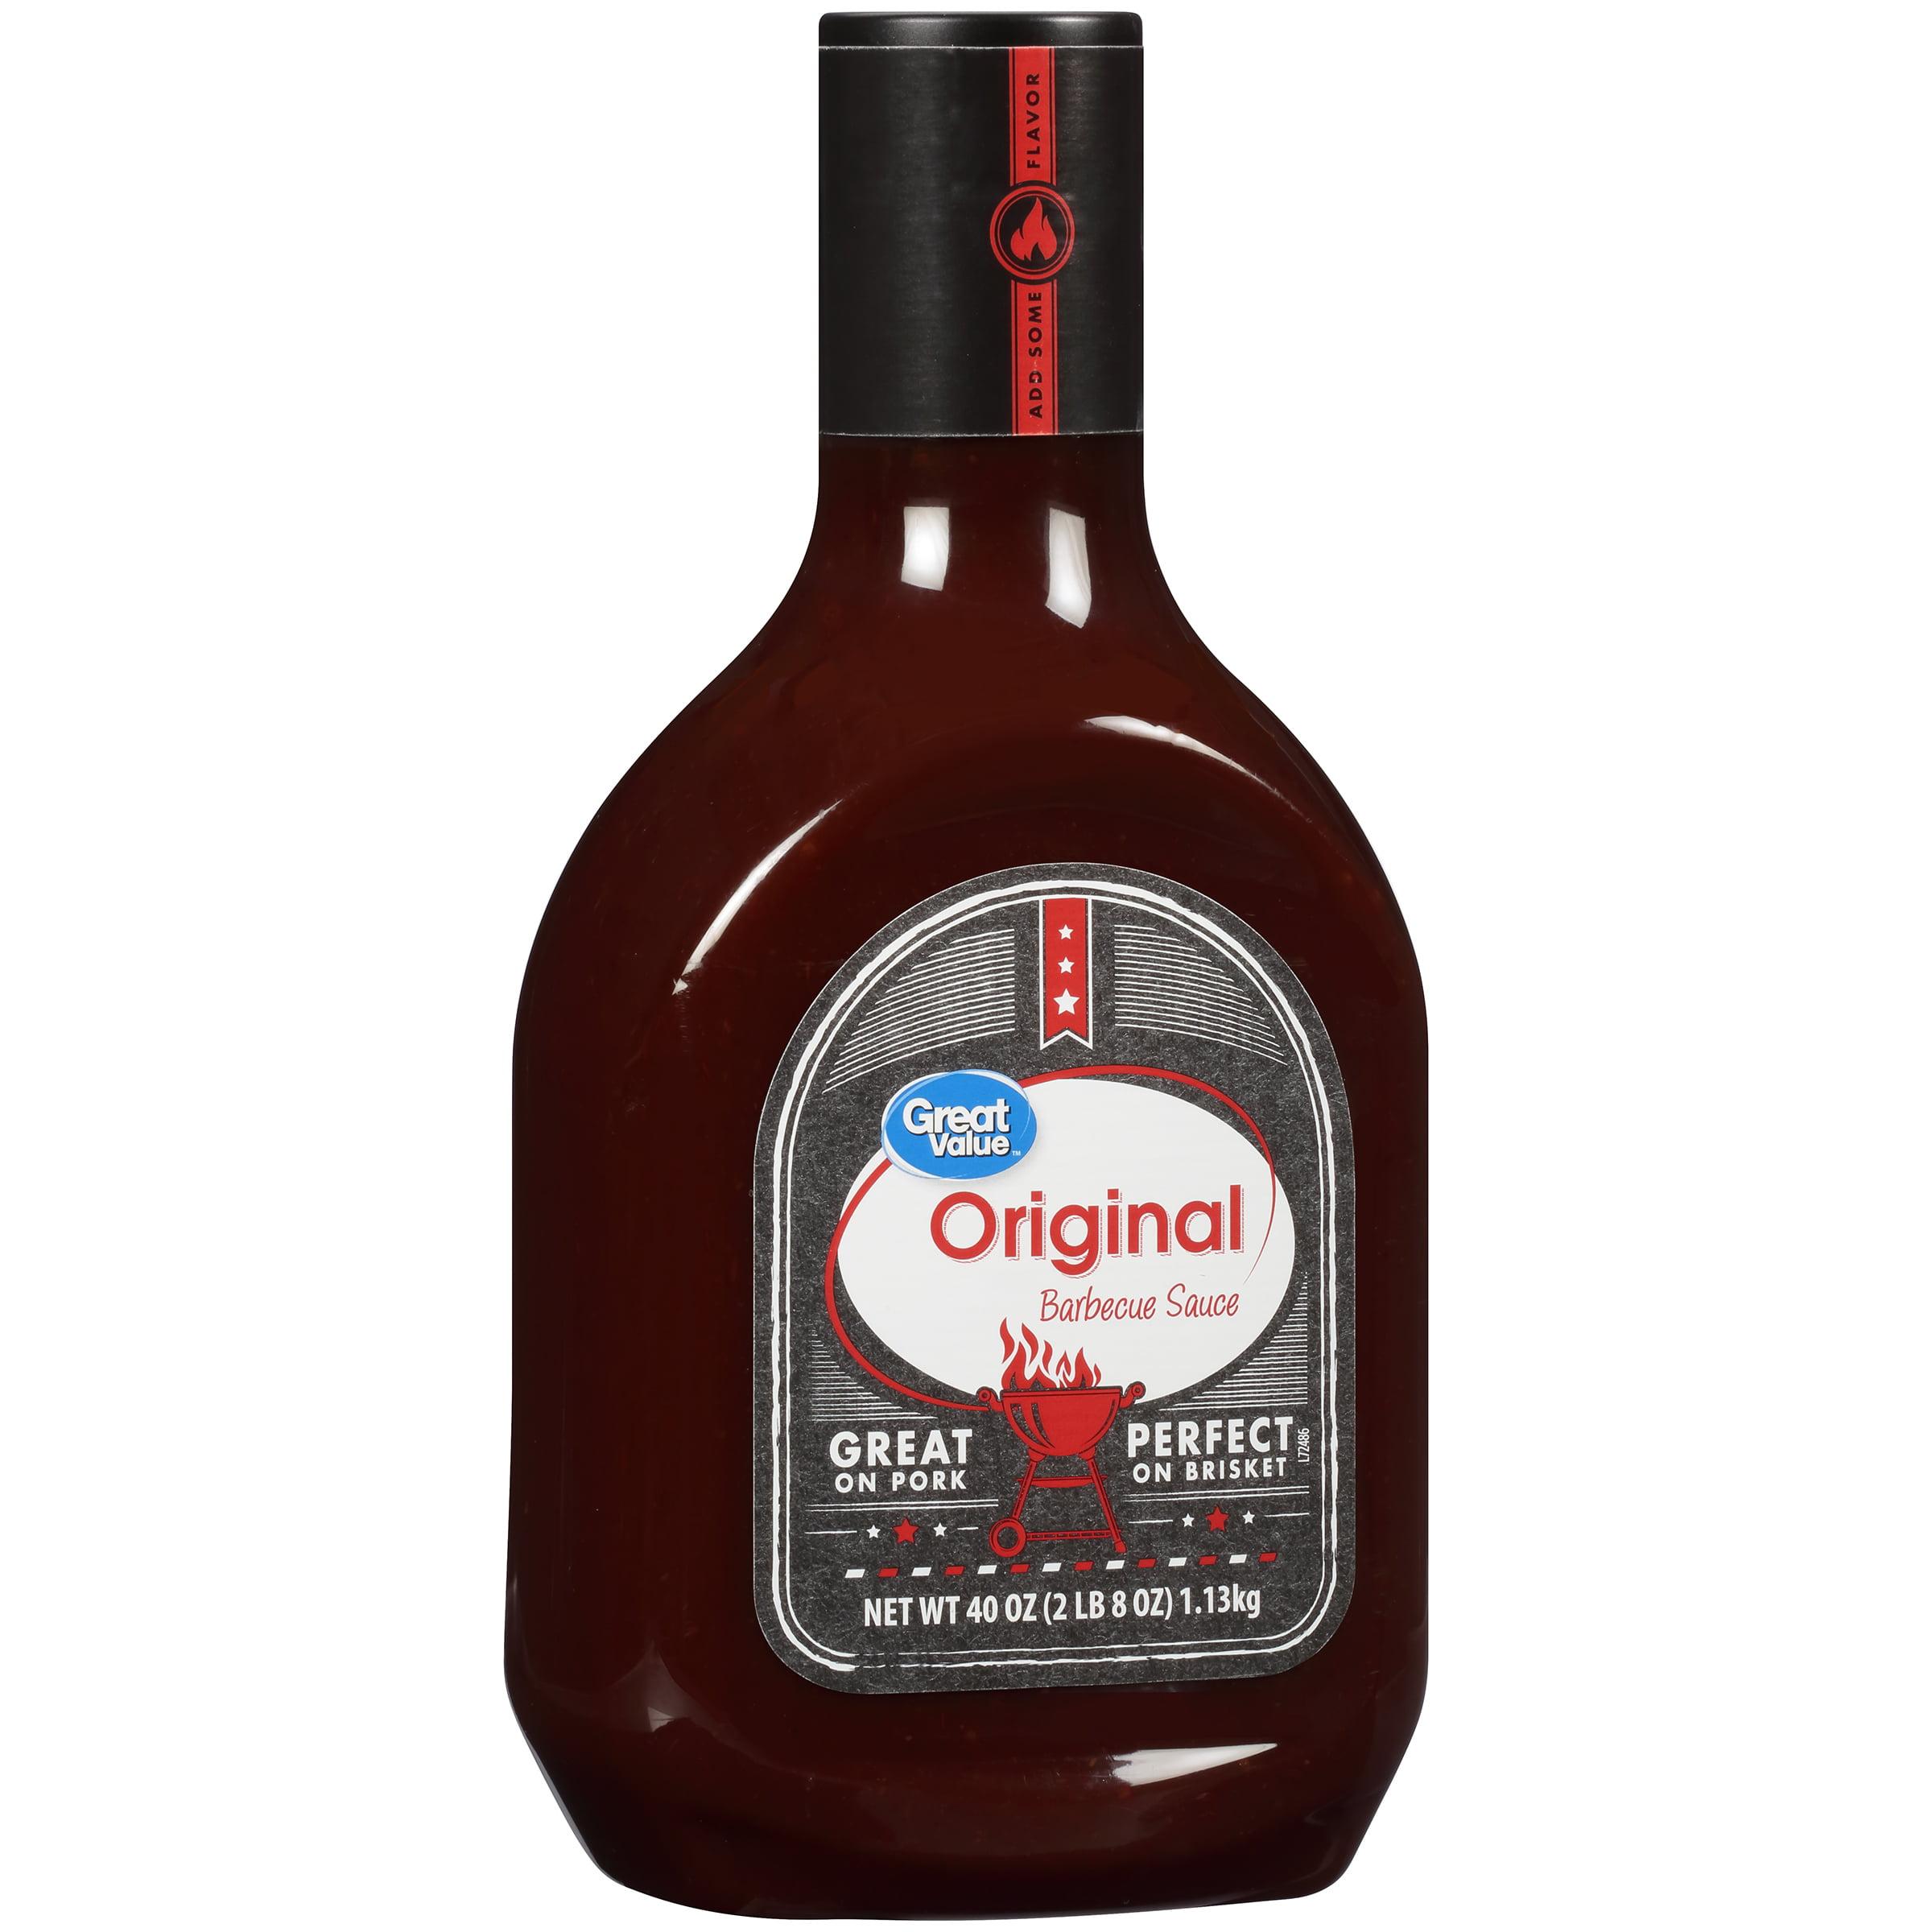 Great Value Original Barbecue Sauce, 40 oz